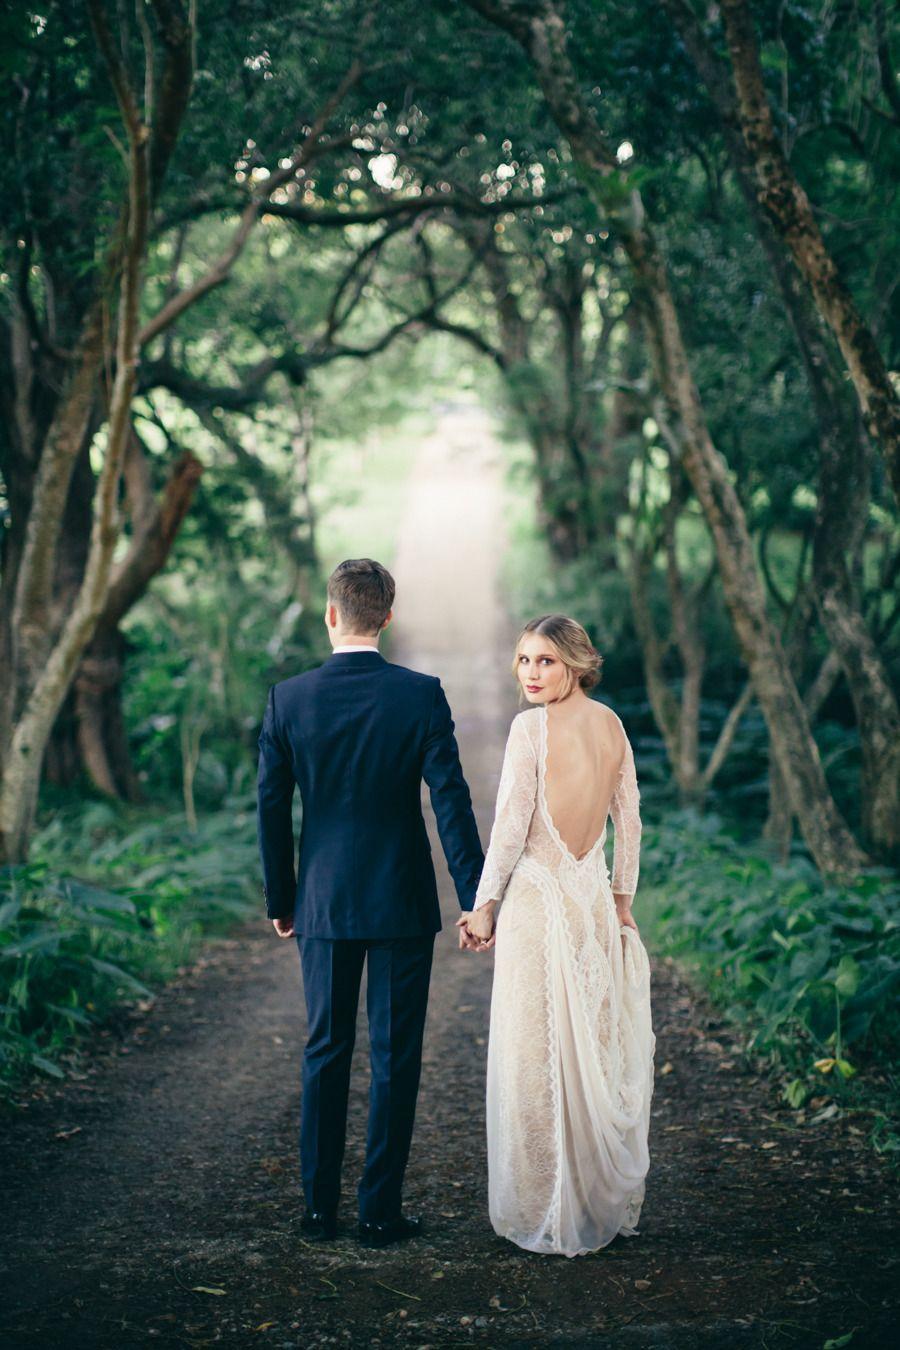 Wedding Photography Websites Inspiration: Romantic French Inspired Wedding Inspiration